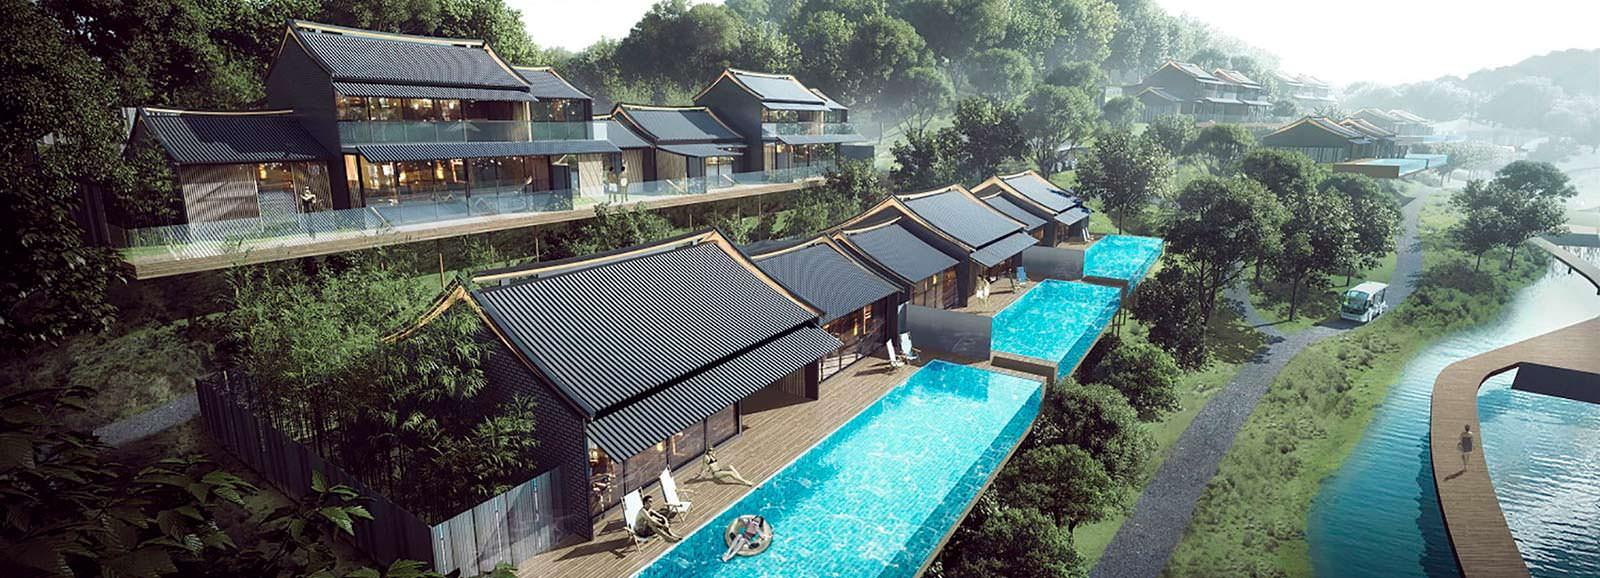 Курорт в китайском стиле от Aedas на острове Хэнгчин